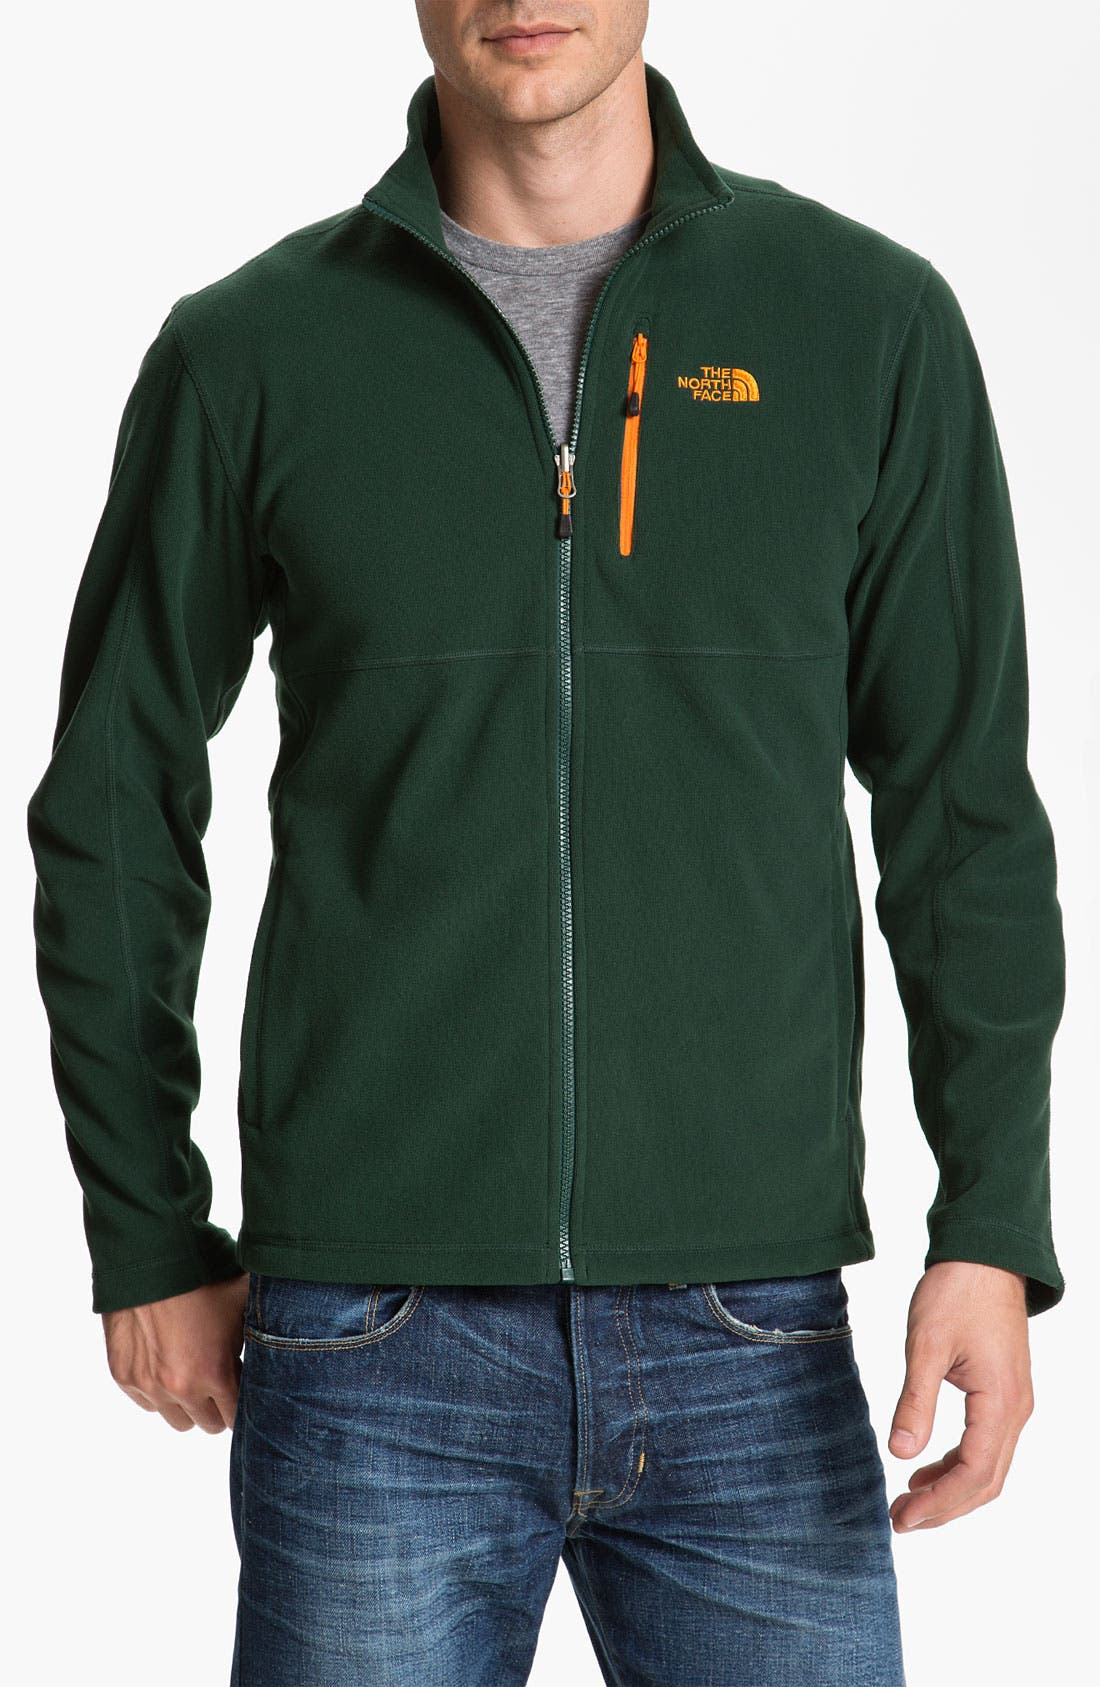 Main Image - The North Face 'TKA 100' Zip Fleece